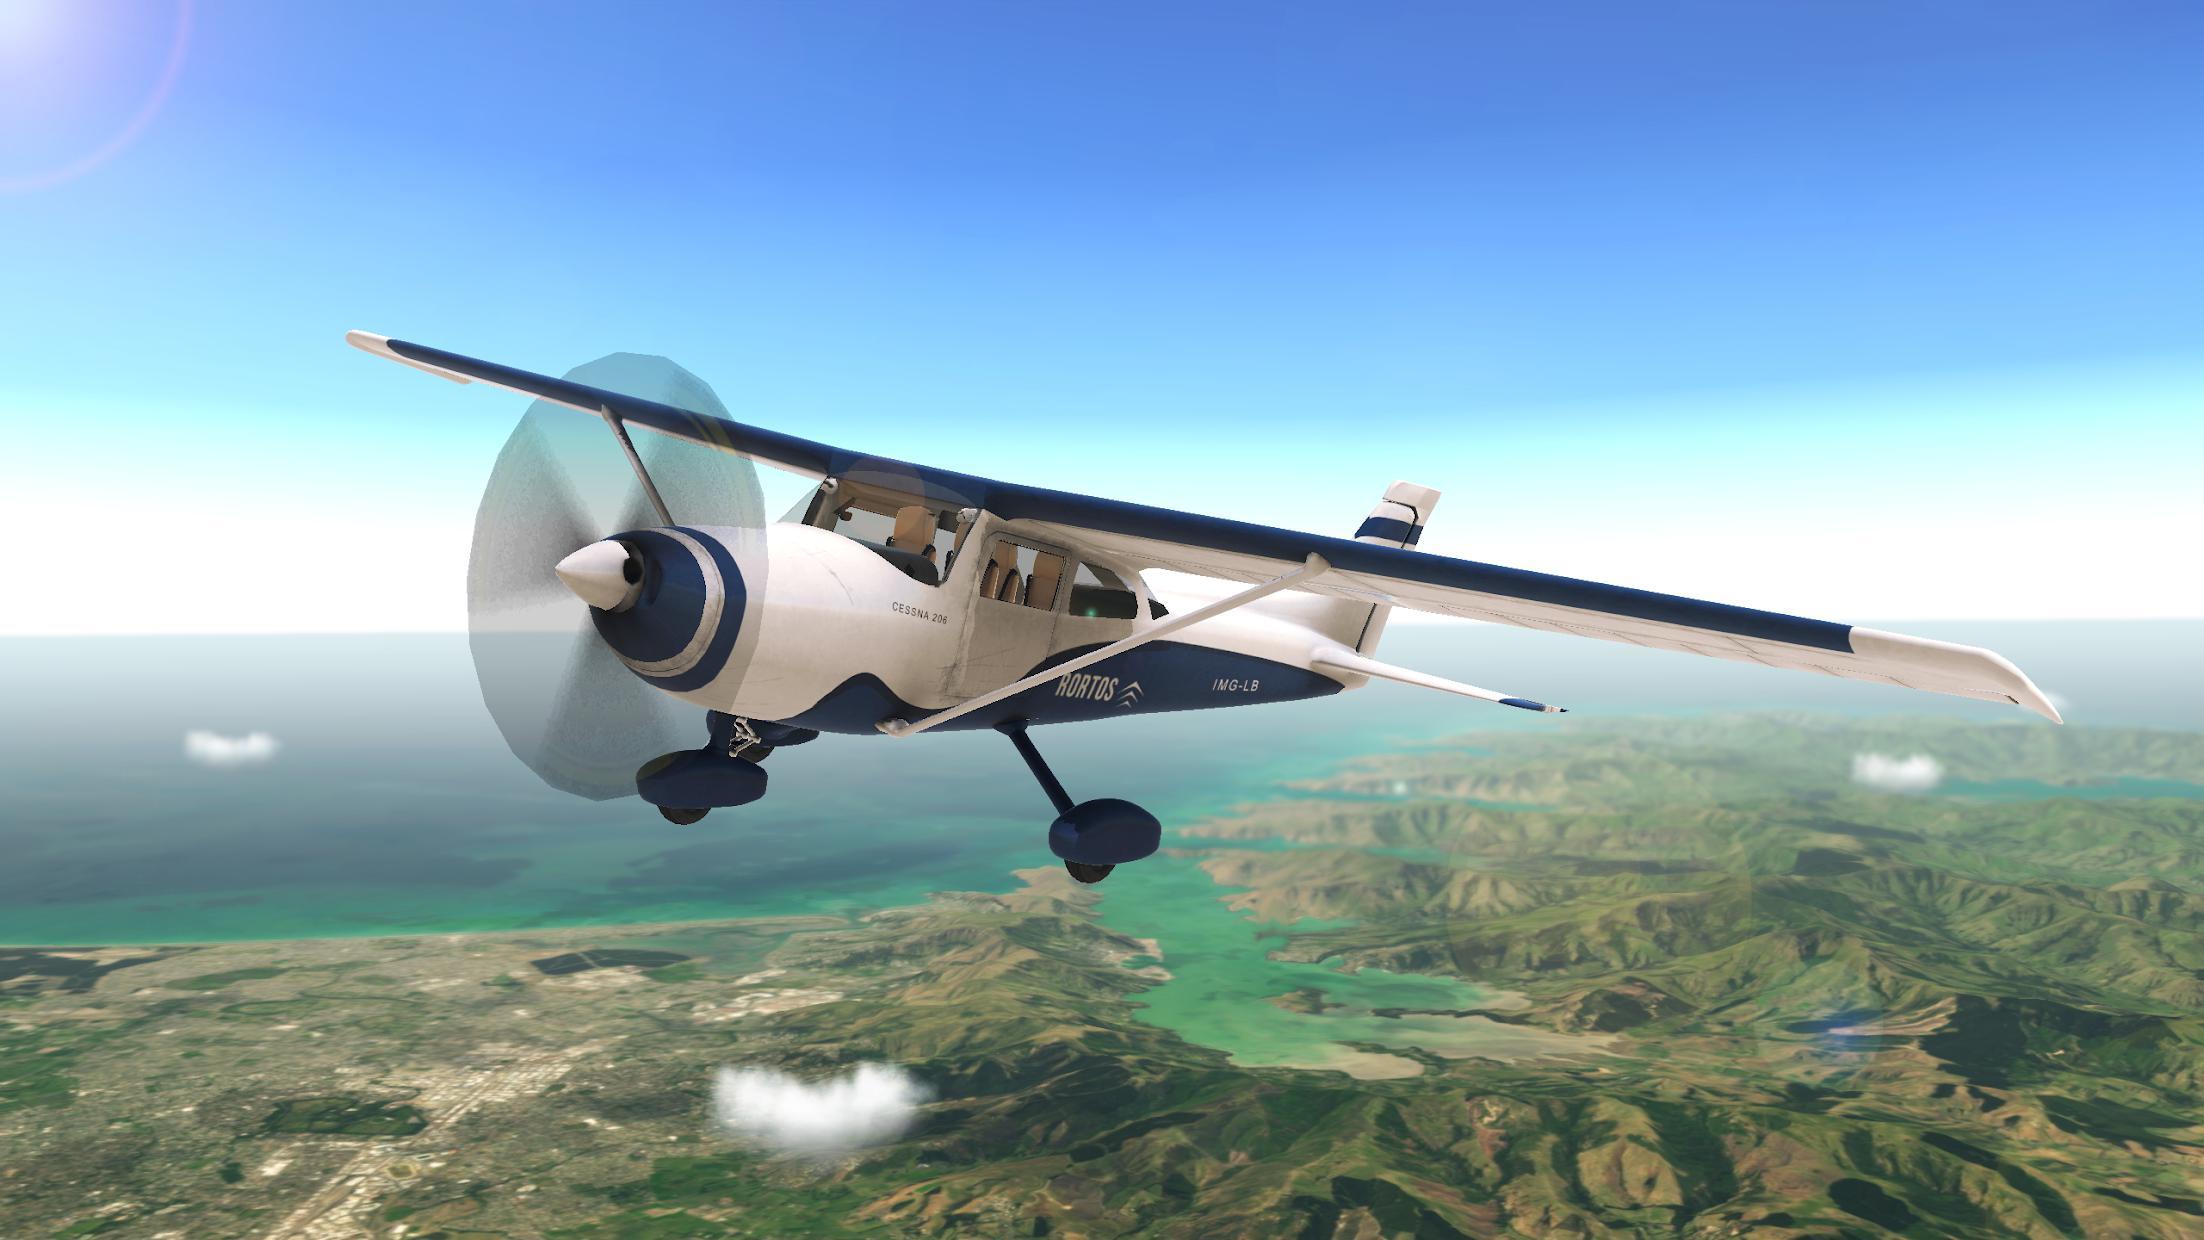 RFS - 真实飞行模拟 游戏截图5